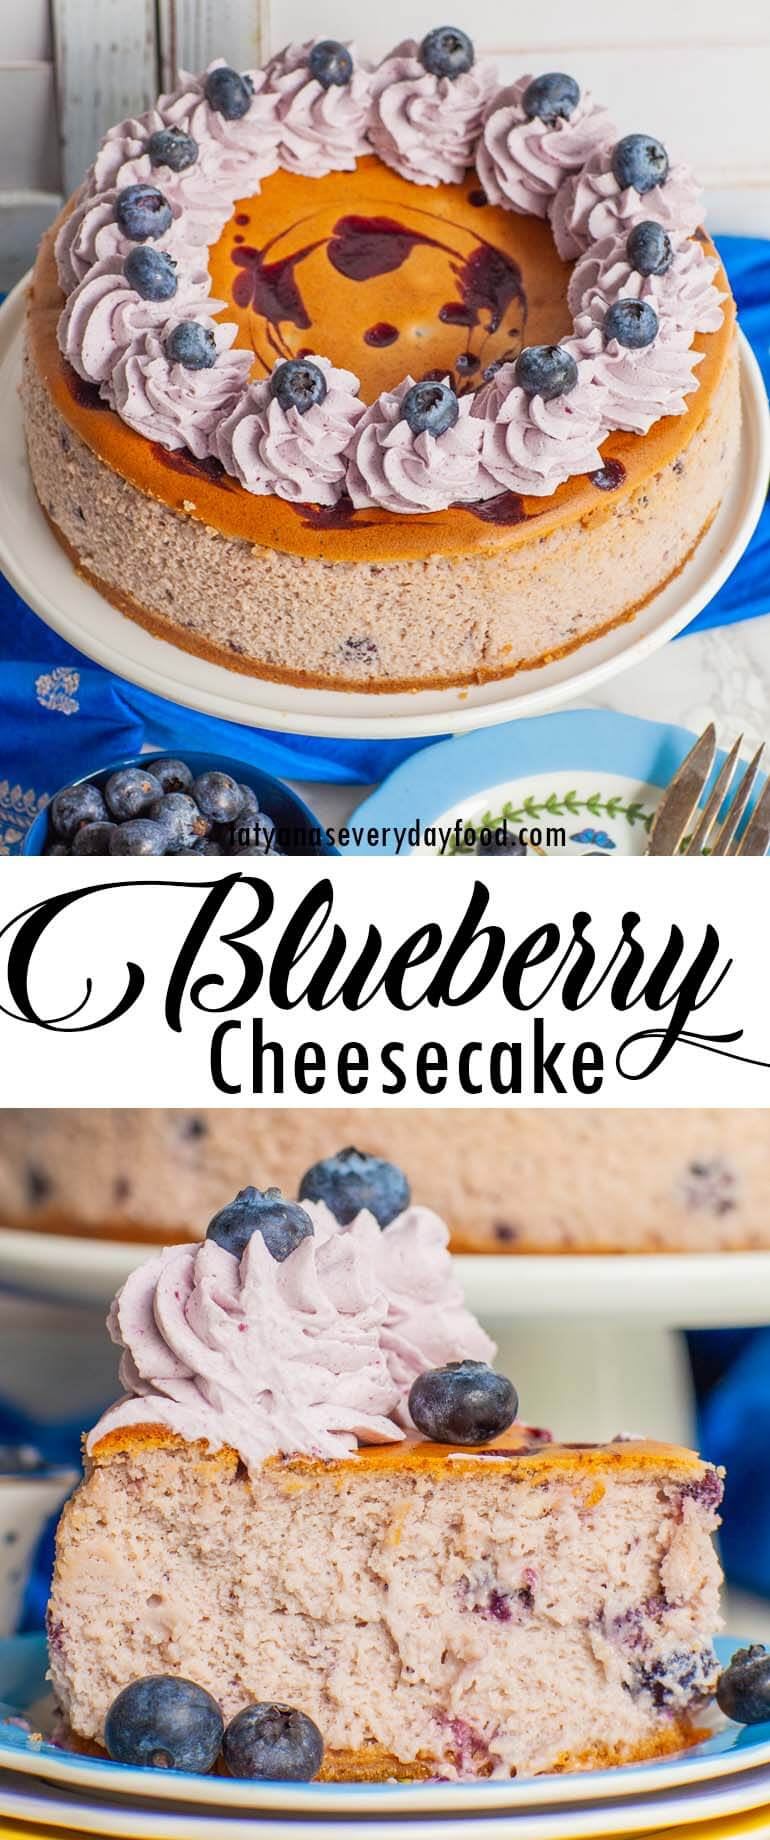 Ricotta Blueberry Cheesecake video recipe